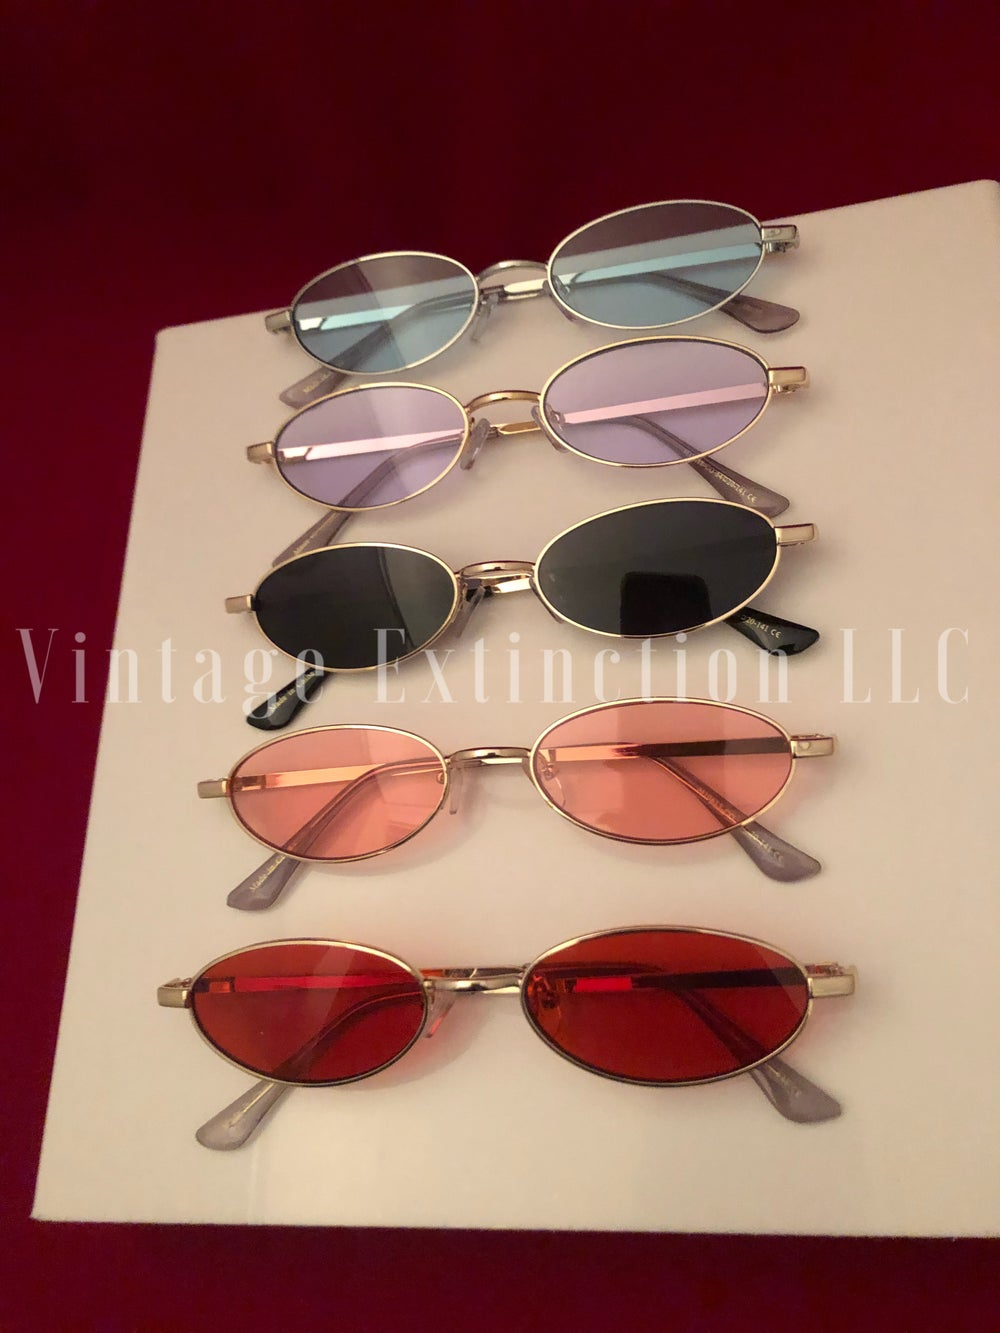 Vibe Premium Frames